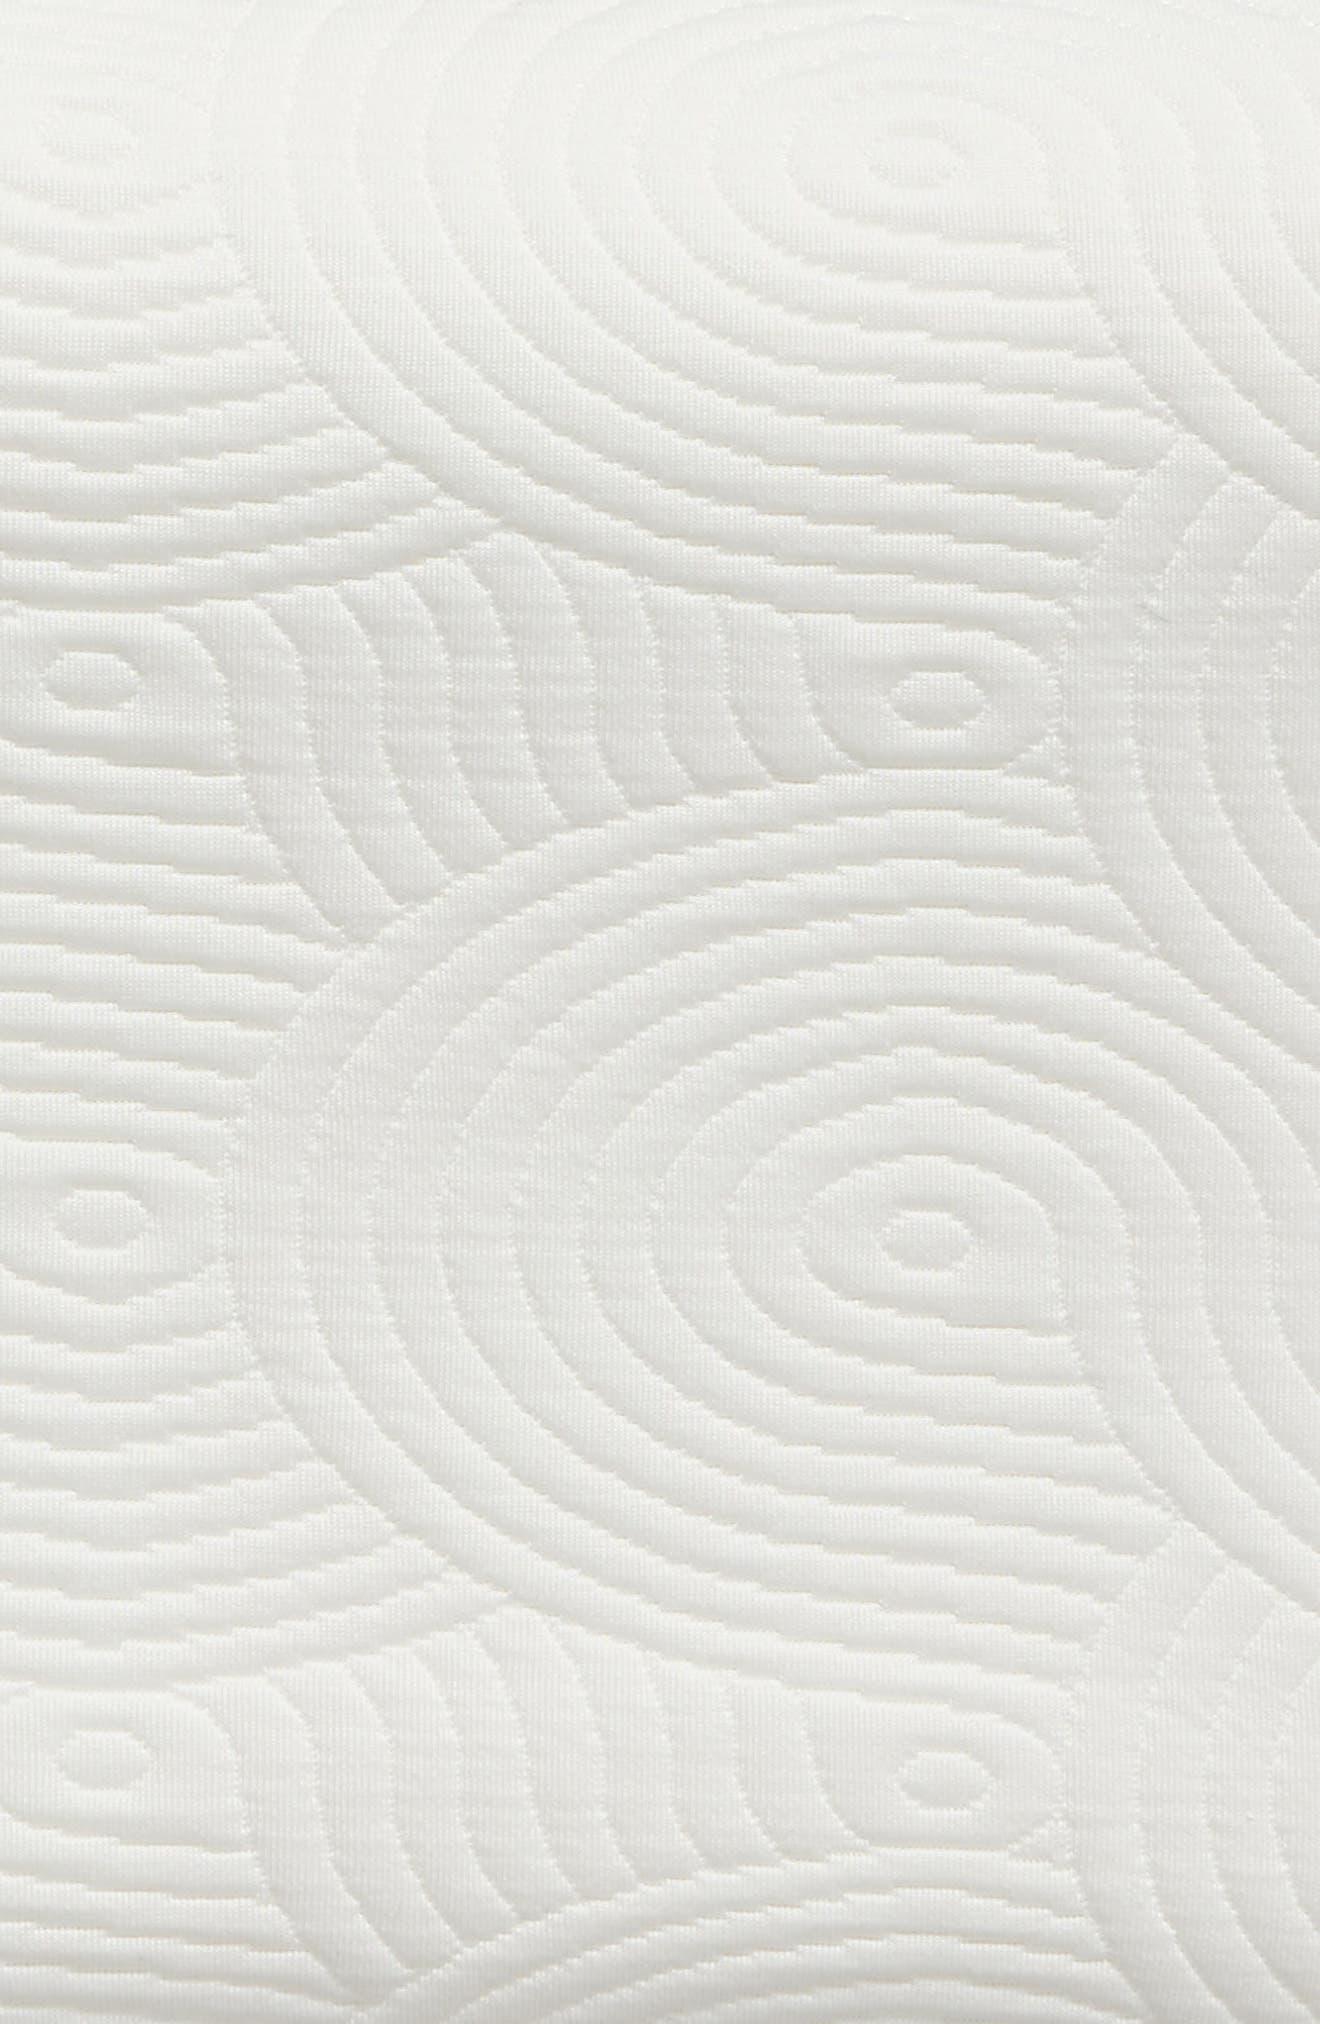 TEMPUR-Contour Side-to-Side Pillow,                             Alternate thumbnail 4, color,                             White